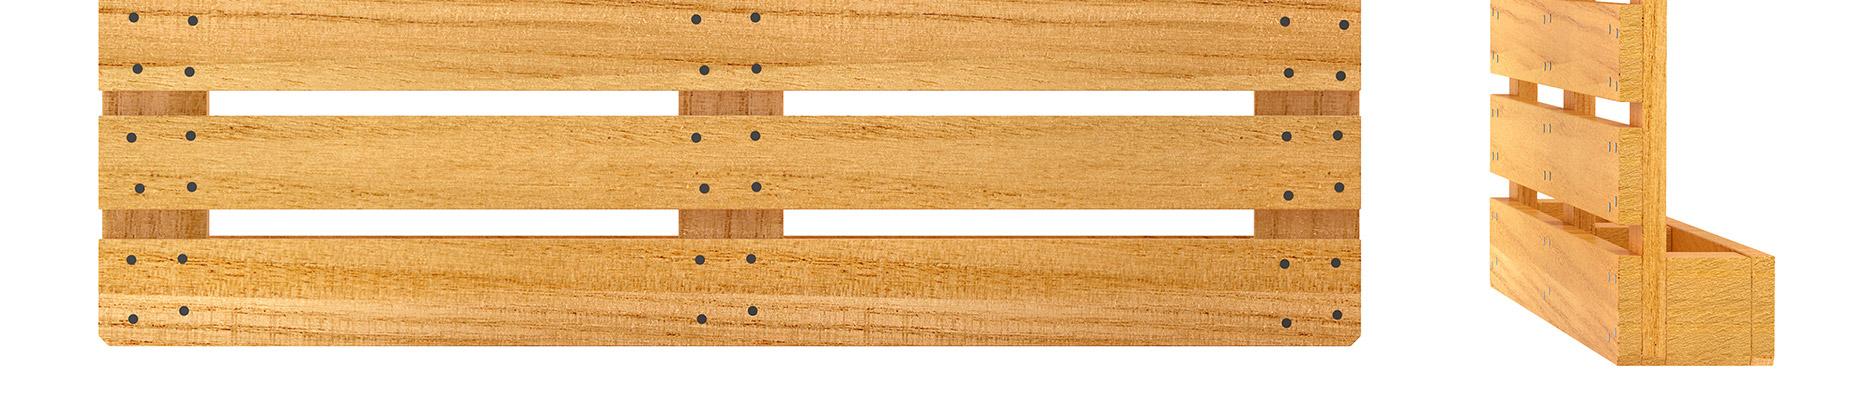 Custom Wood Pallet Manufacturer | Richmond, VA | BC Wood ...